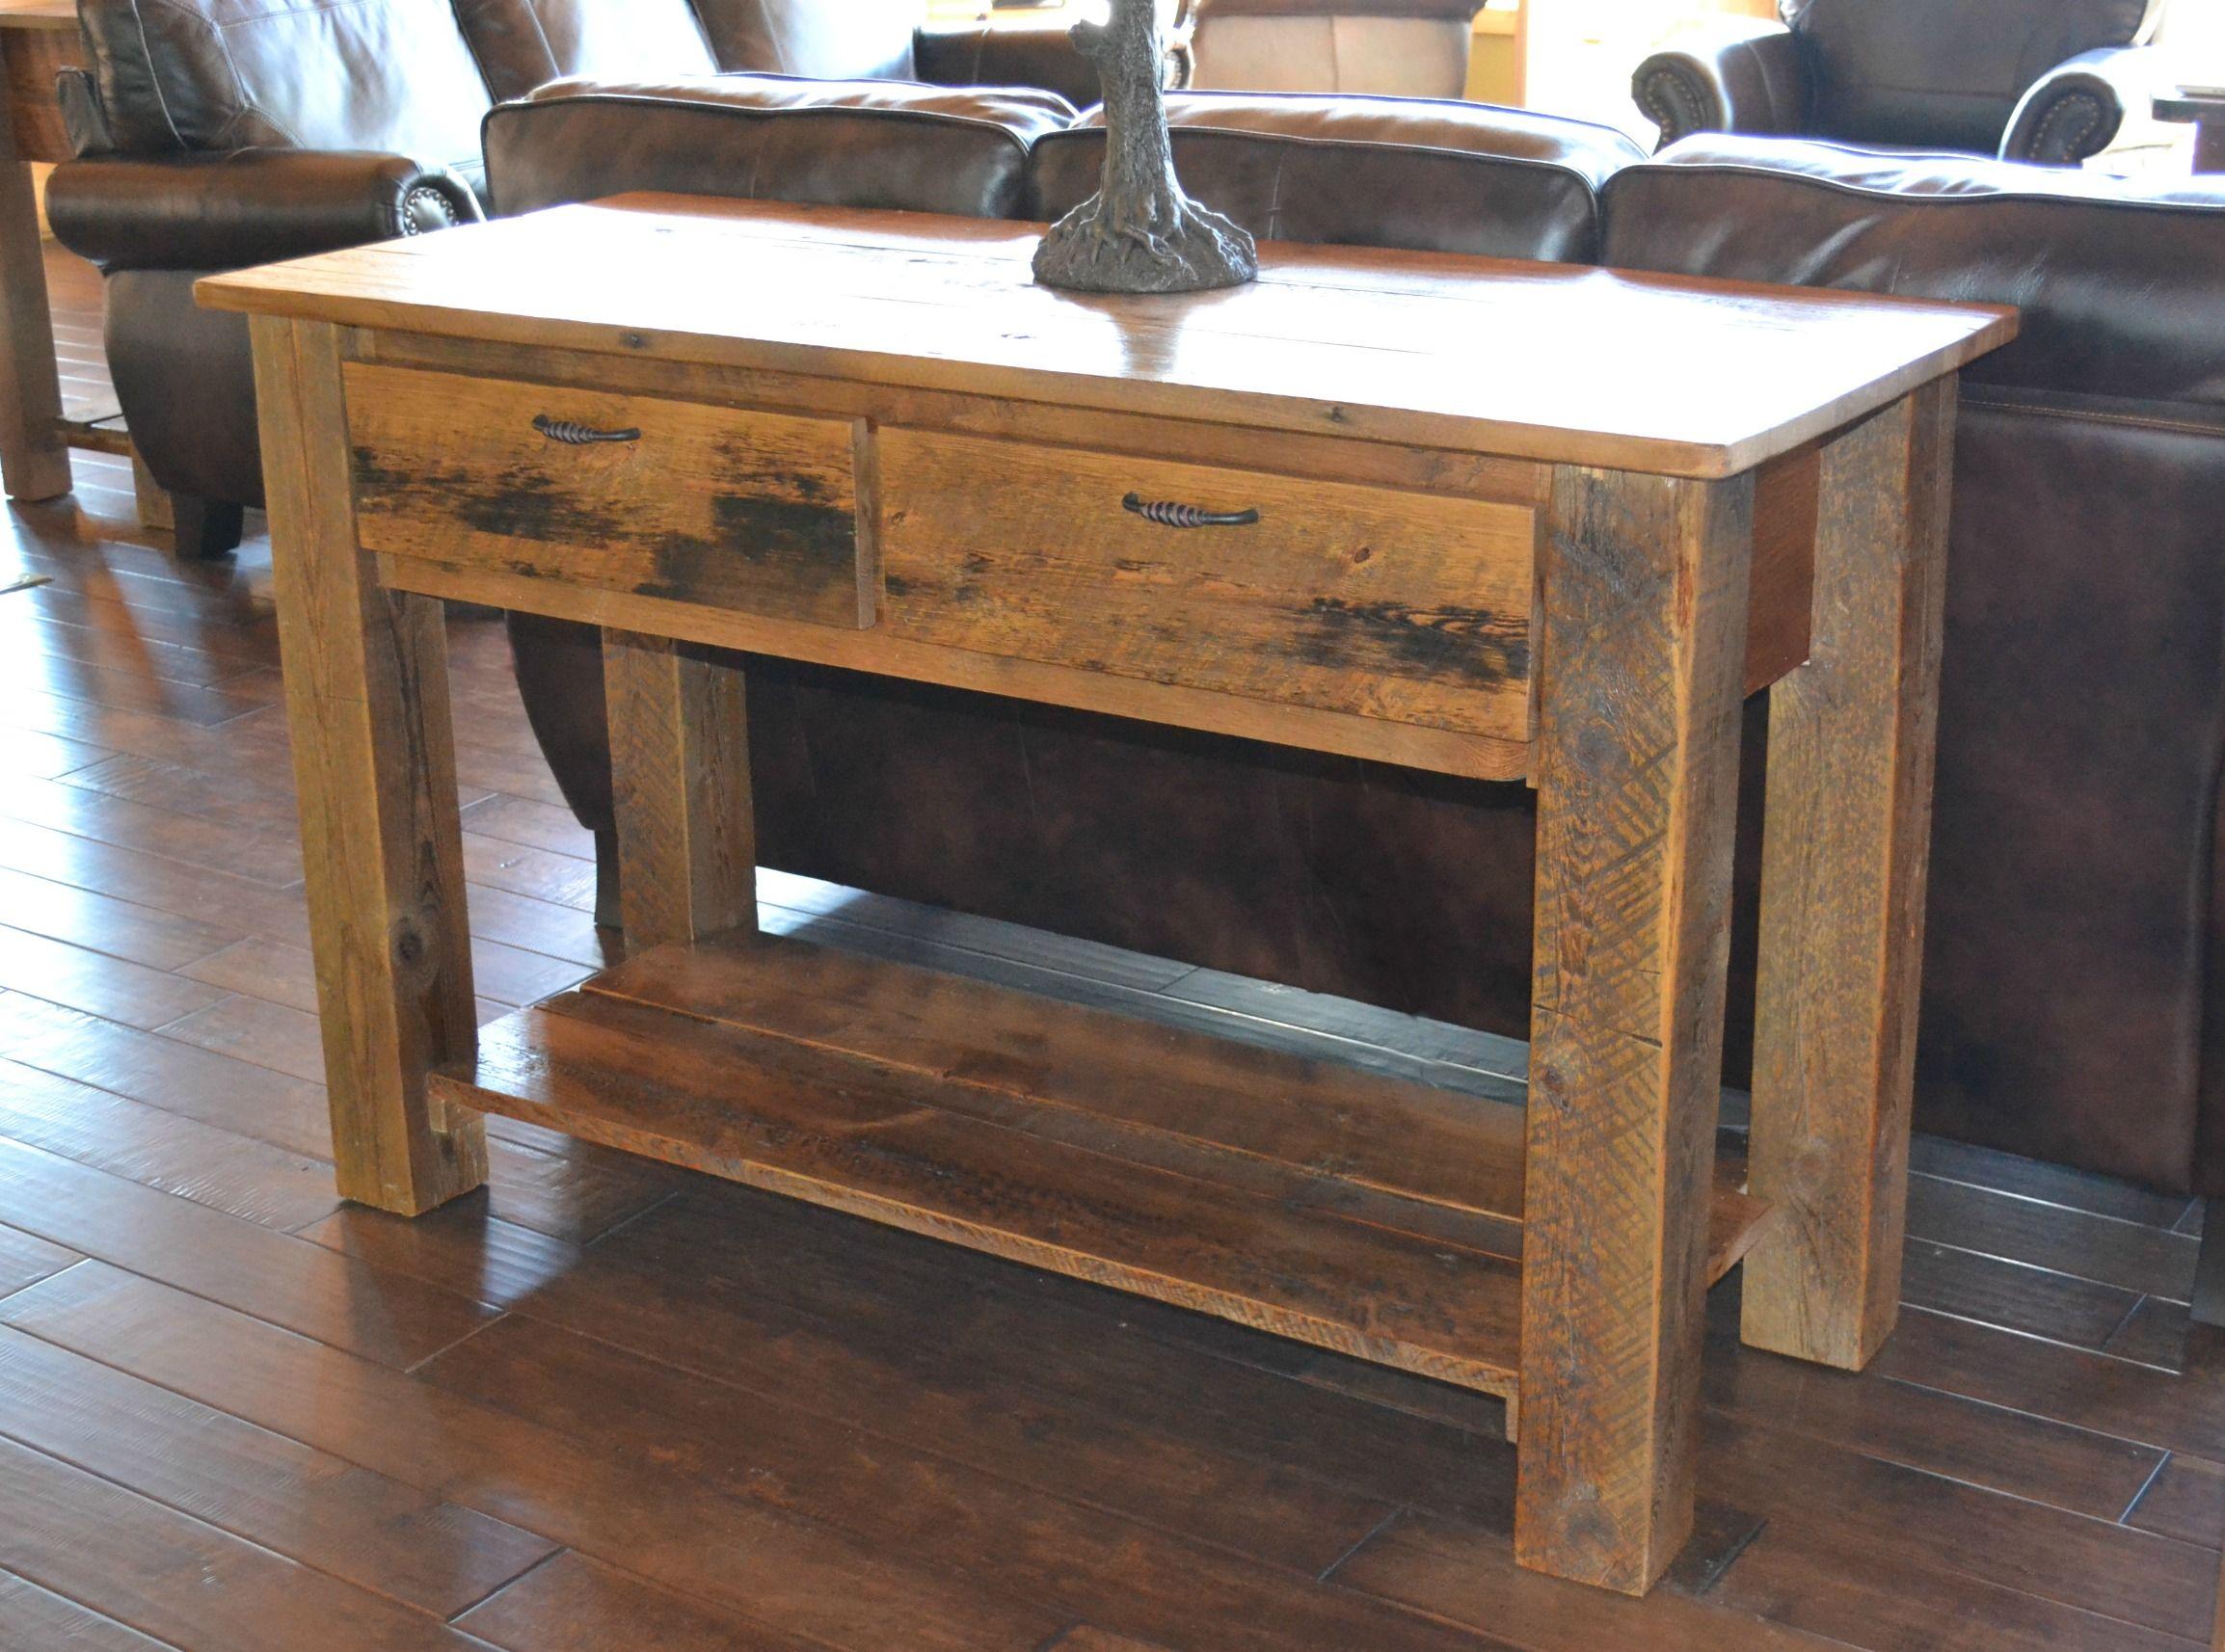 Reclaimed barn wood reclaimed barn wood furniture rustic furniture mall by timber creek